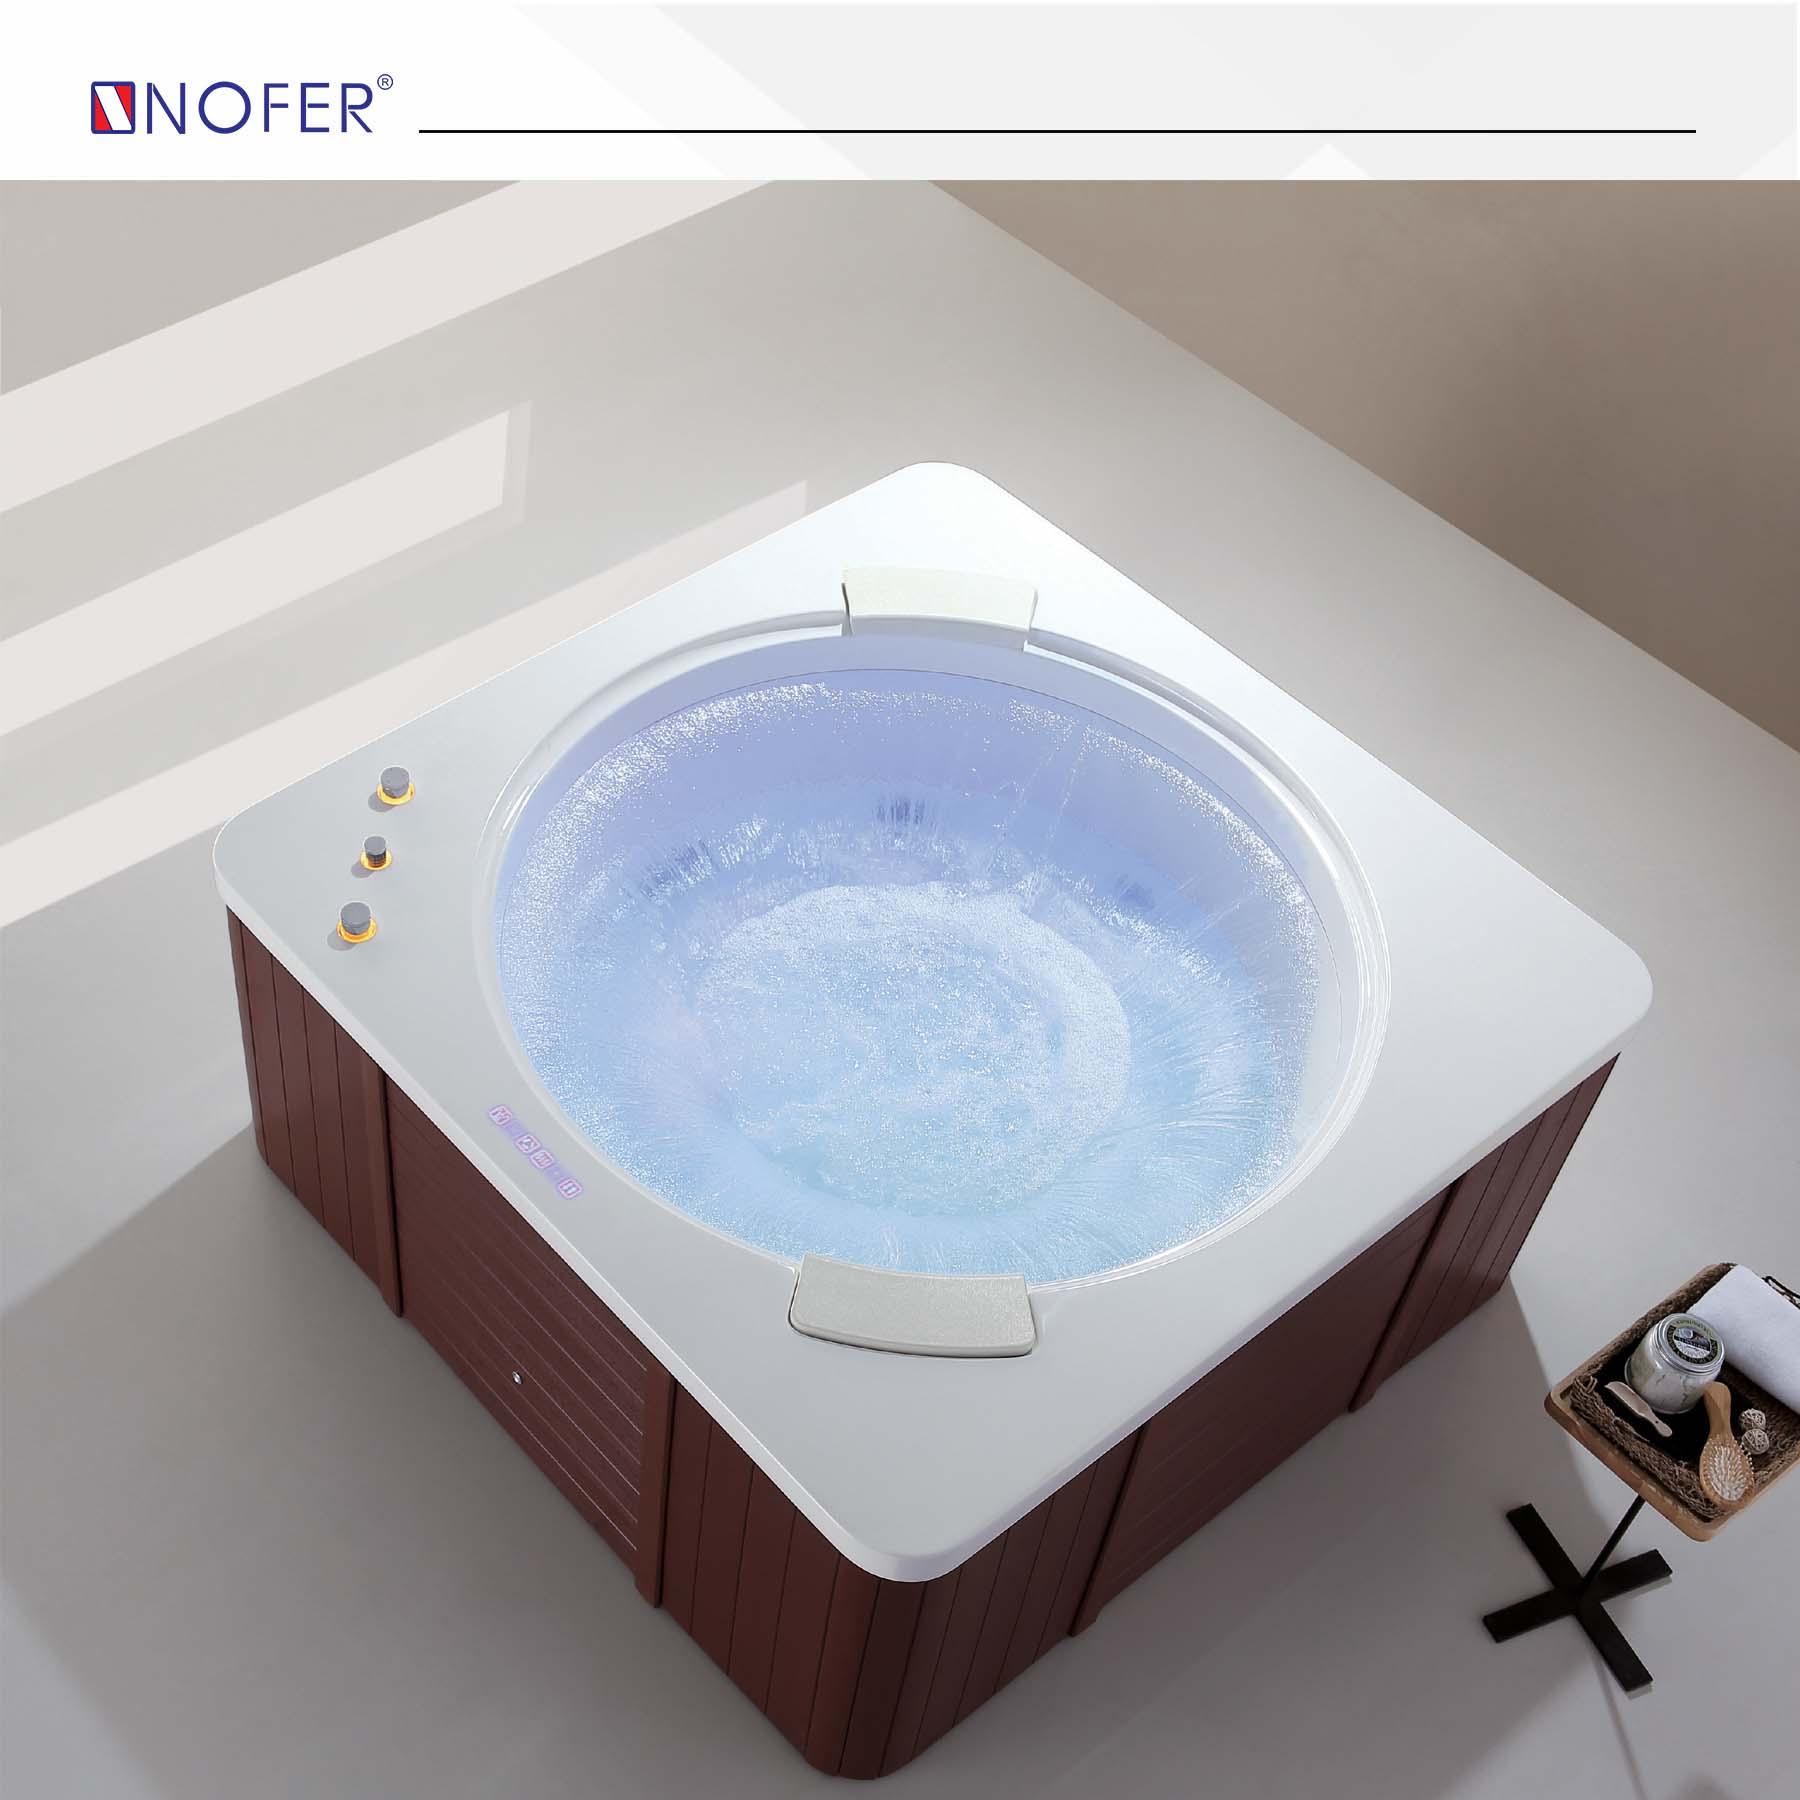 Bôn tắm massage NG-7400